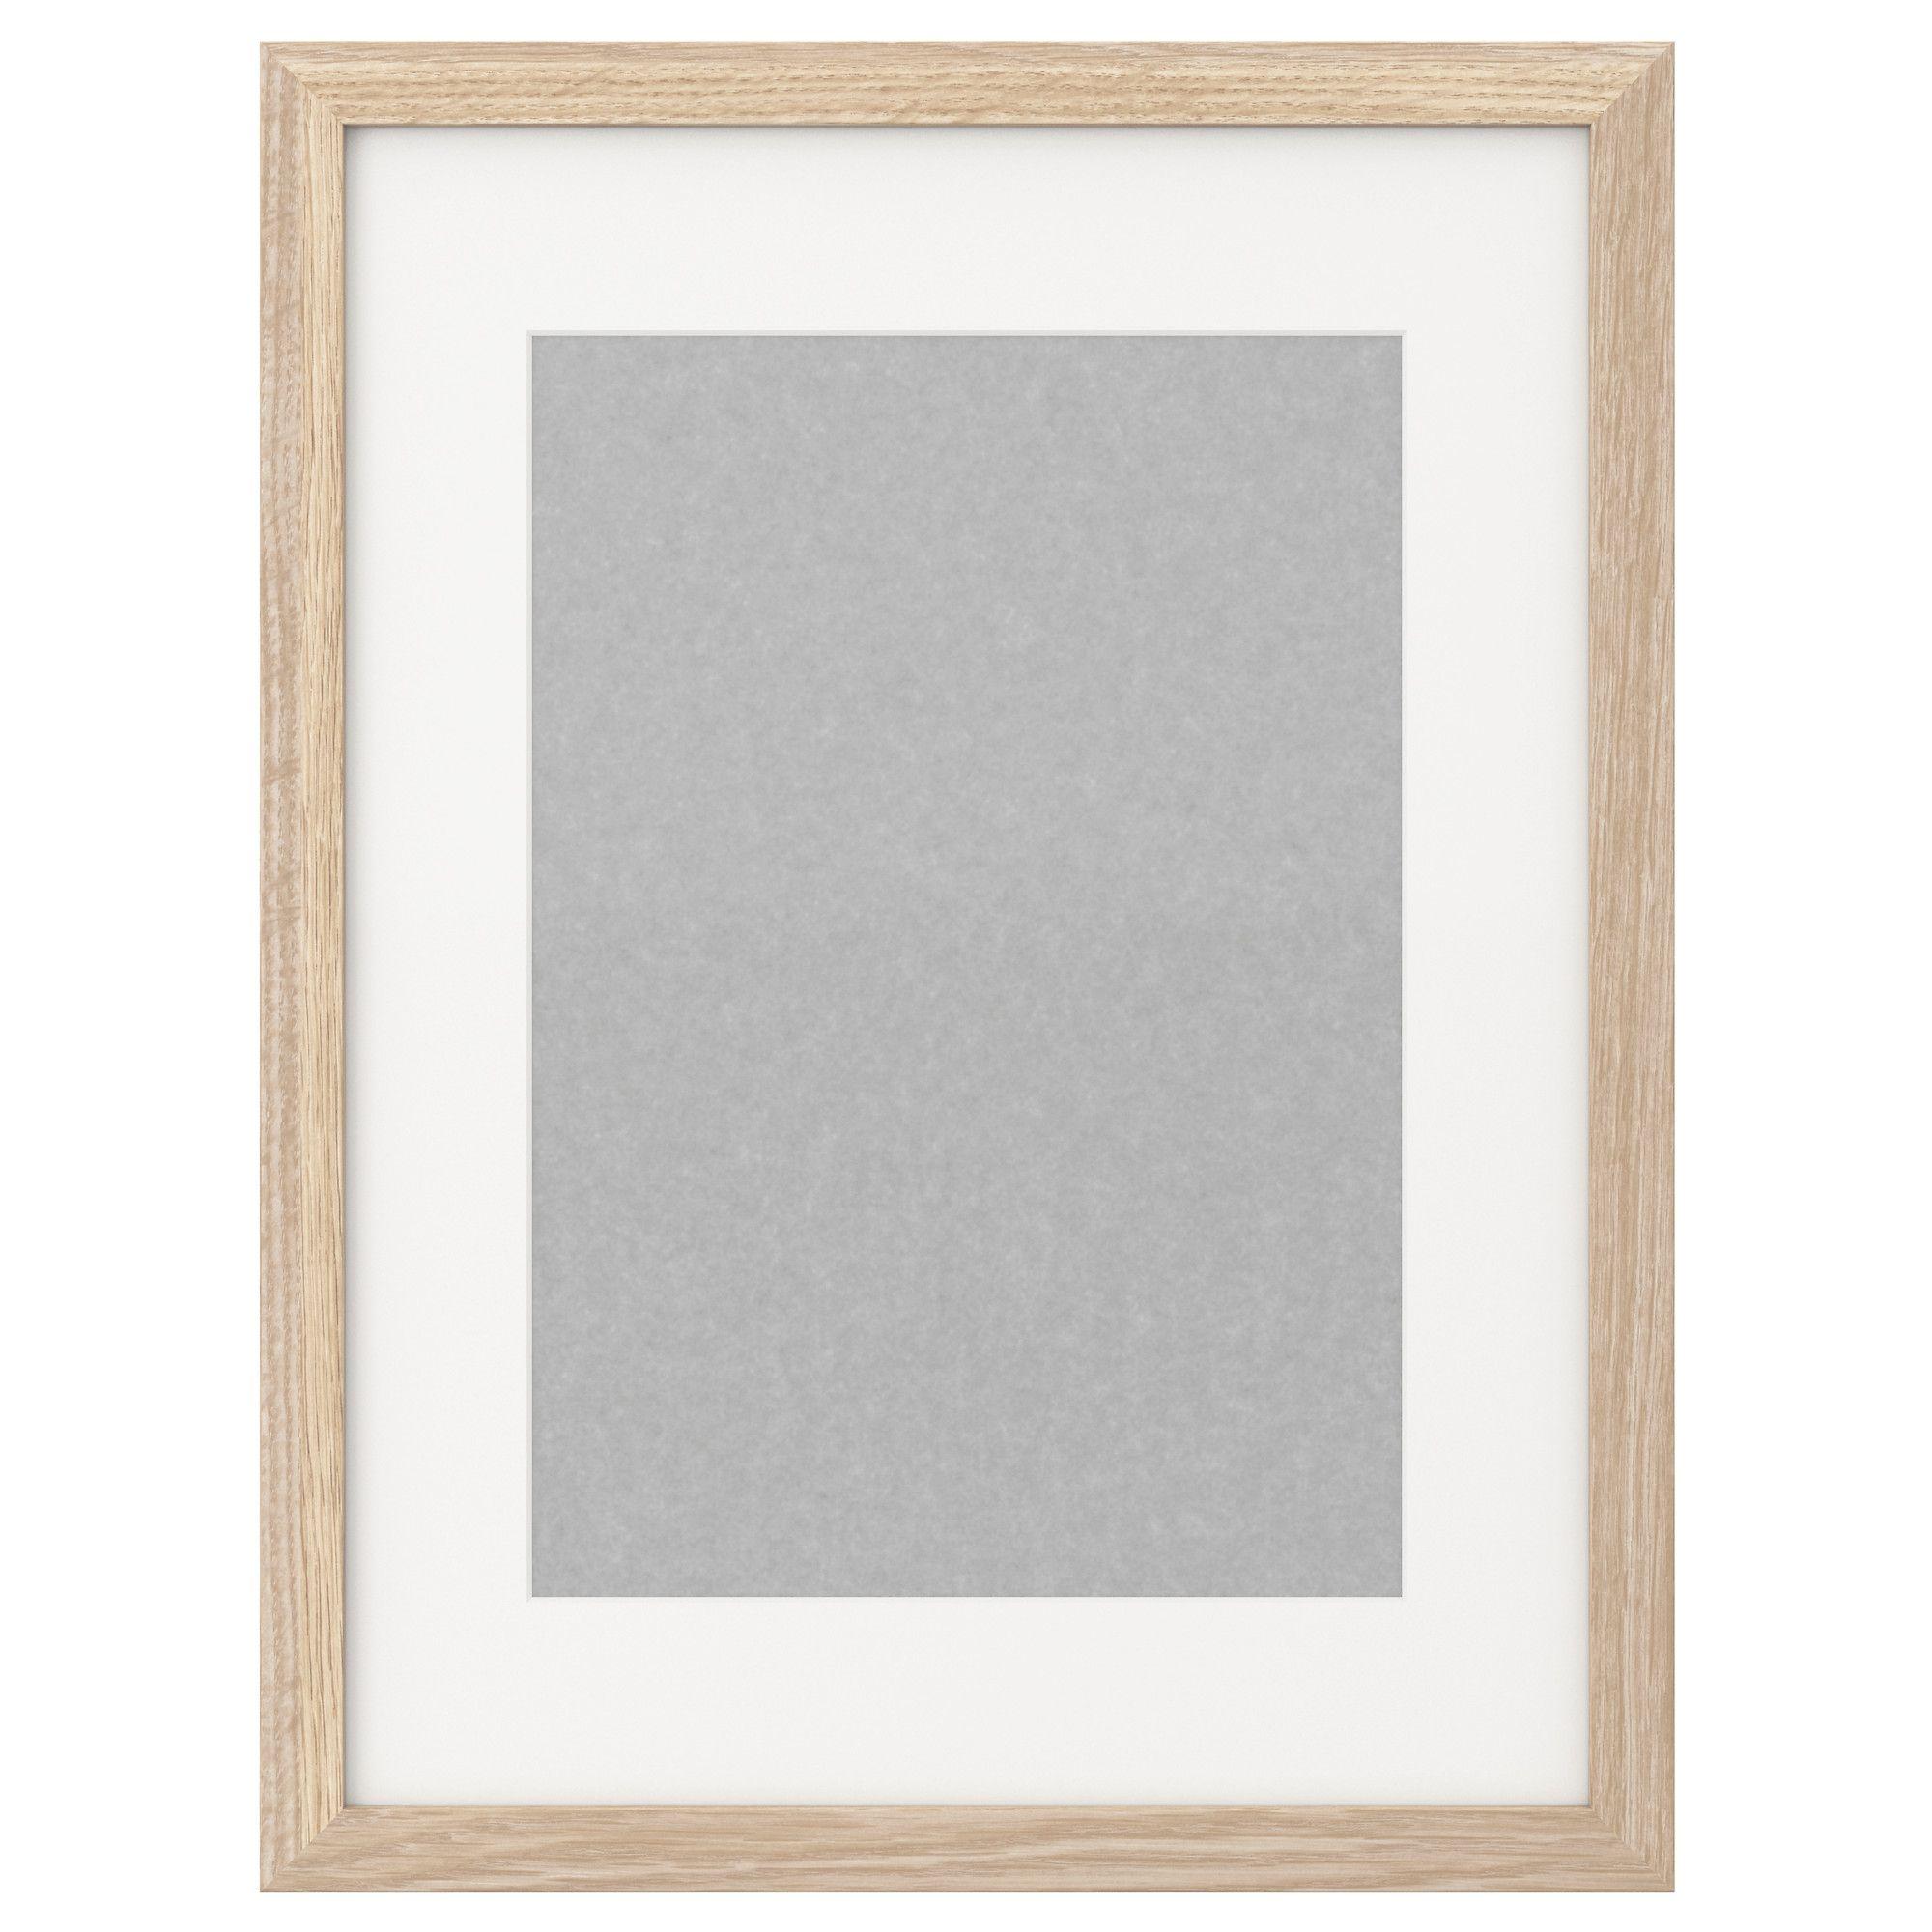 RIBBA Frame - white stained oak effect - IKEA | BeGood | Pinterest ...